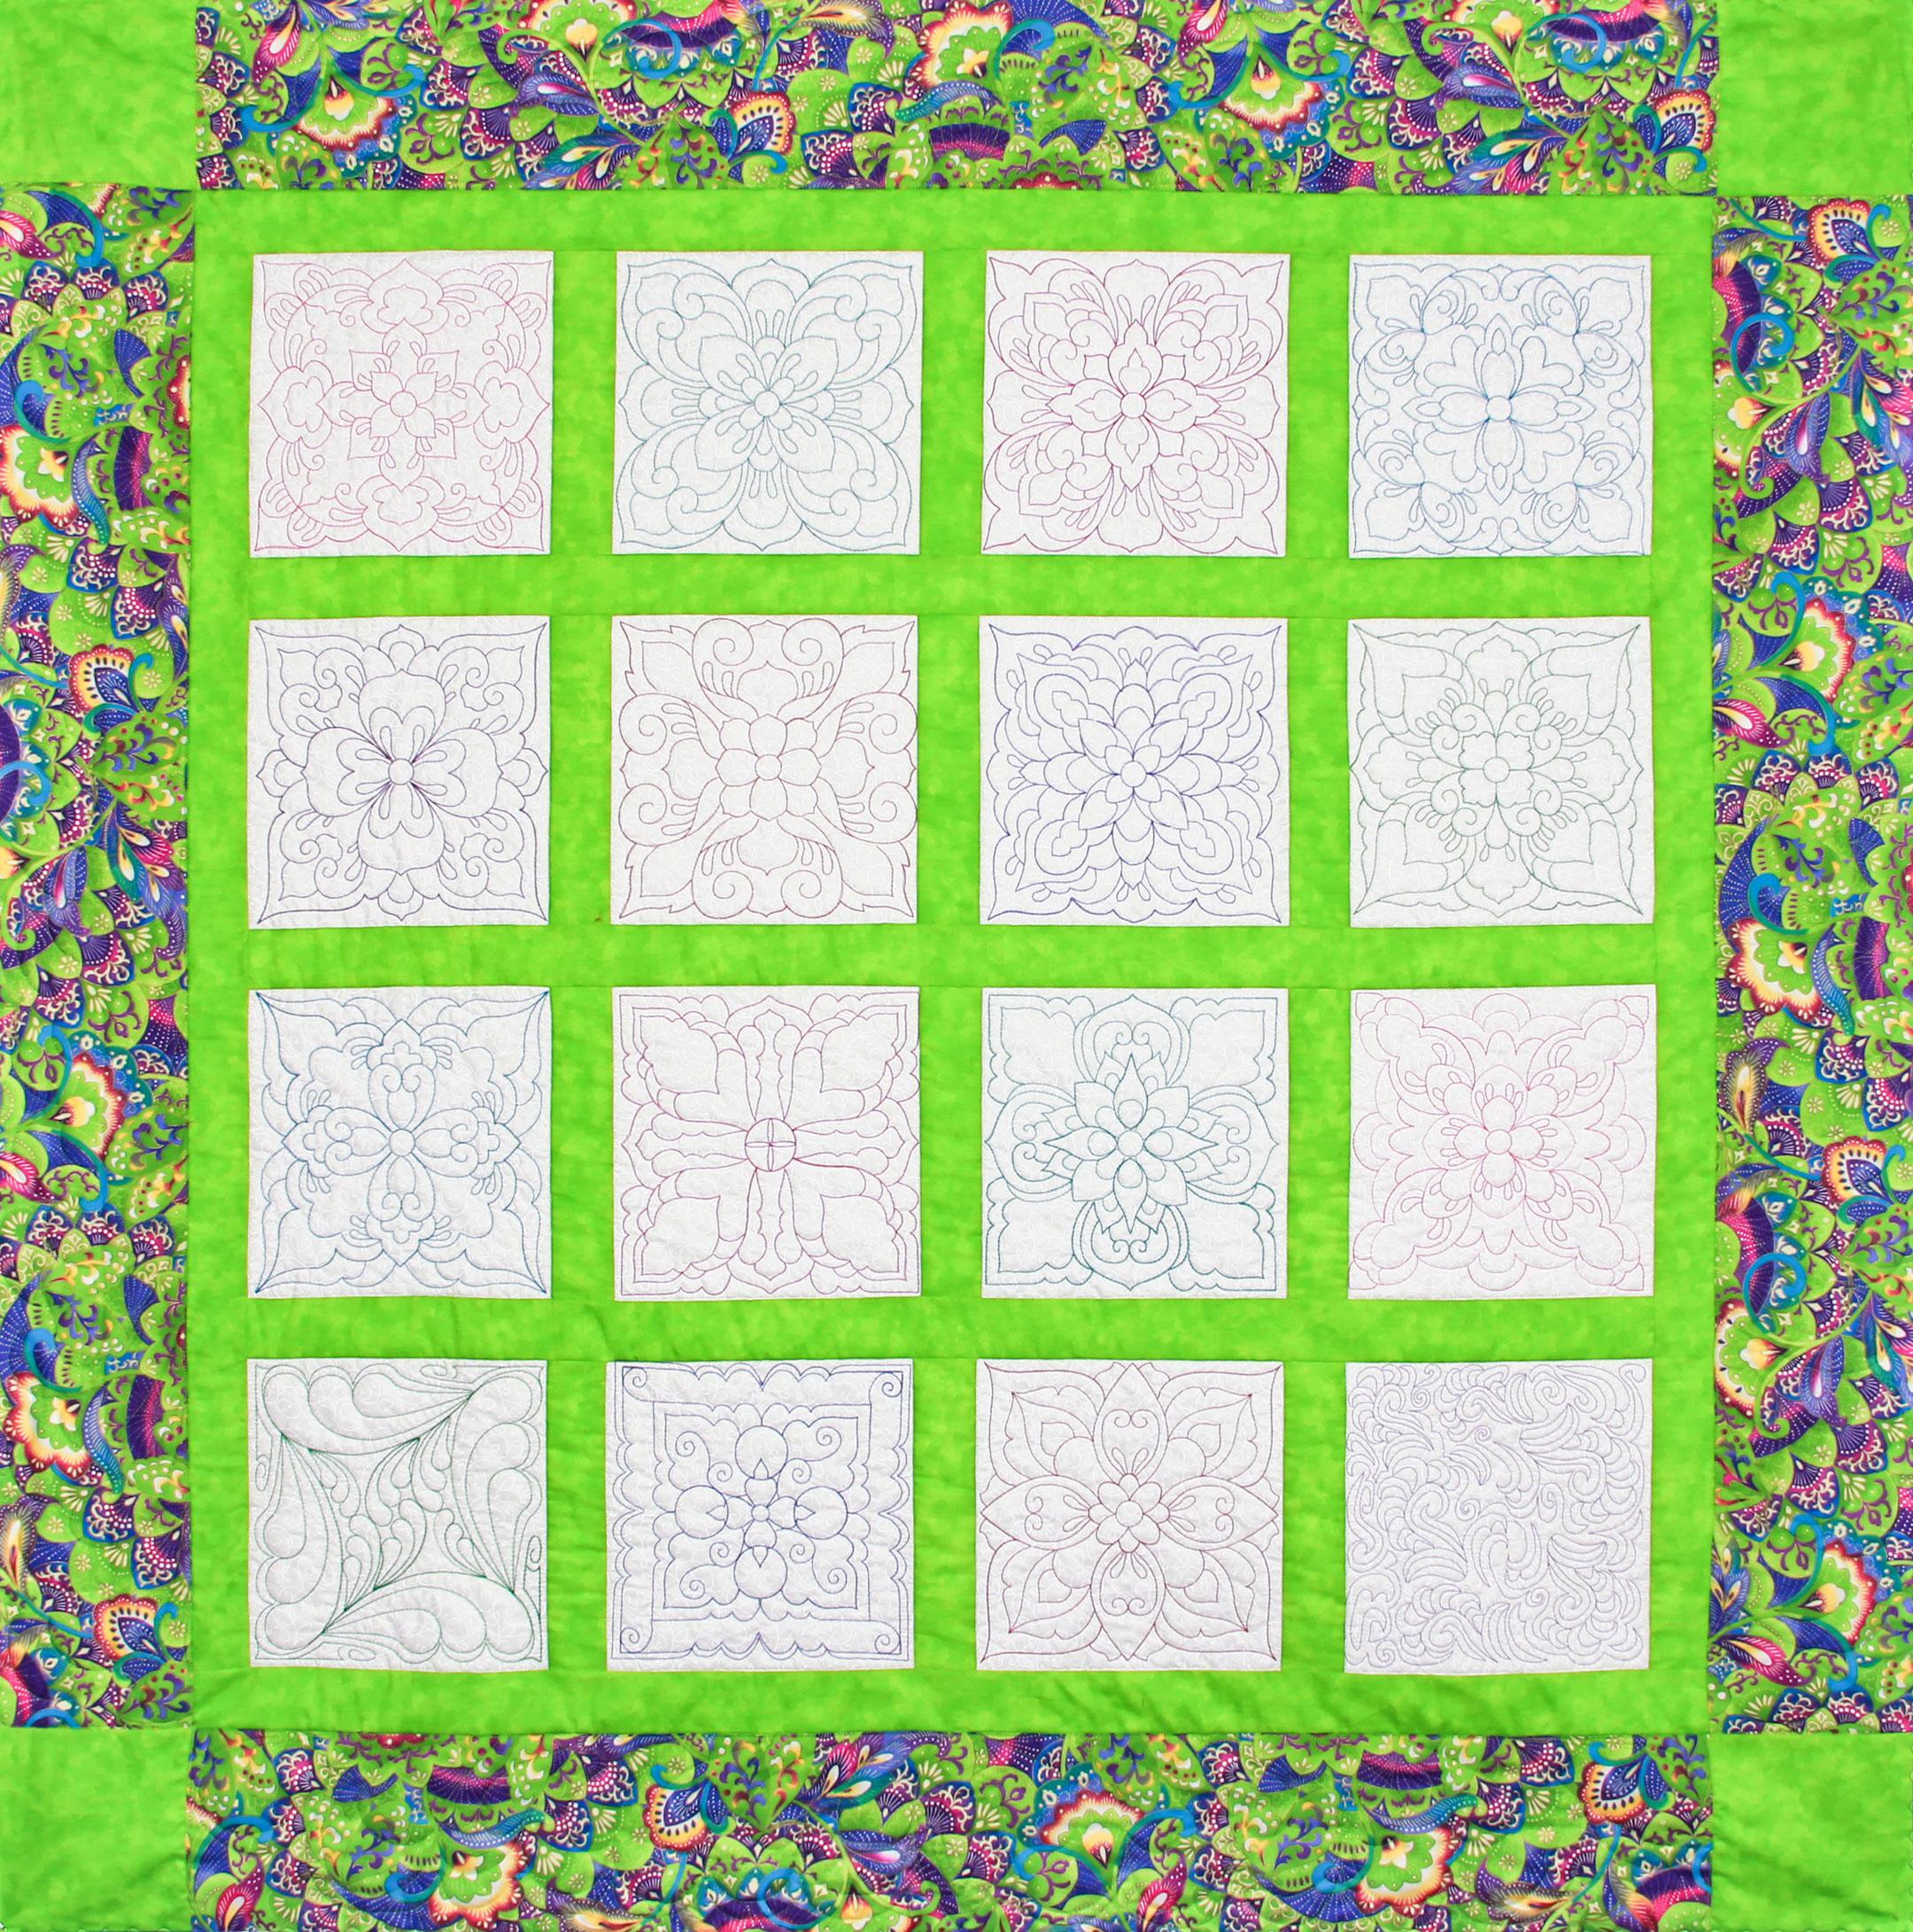 Quilting-Designs-1-Quilt.jpg